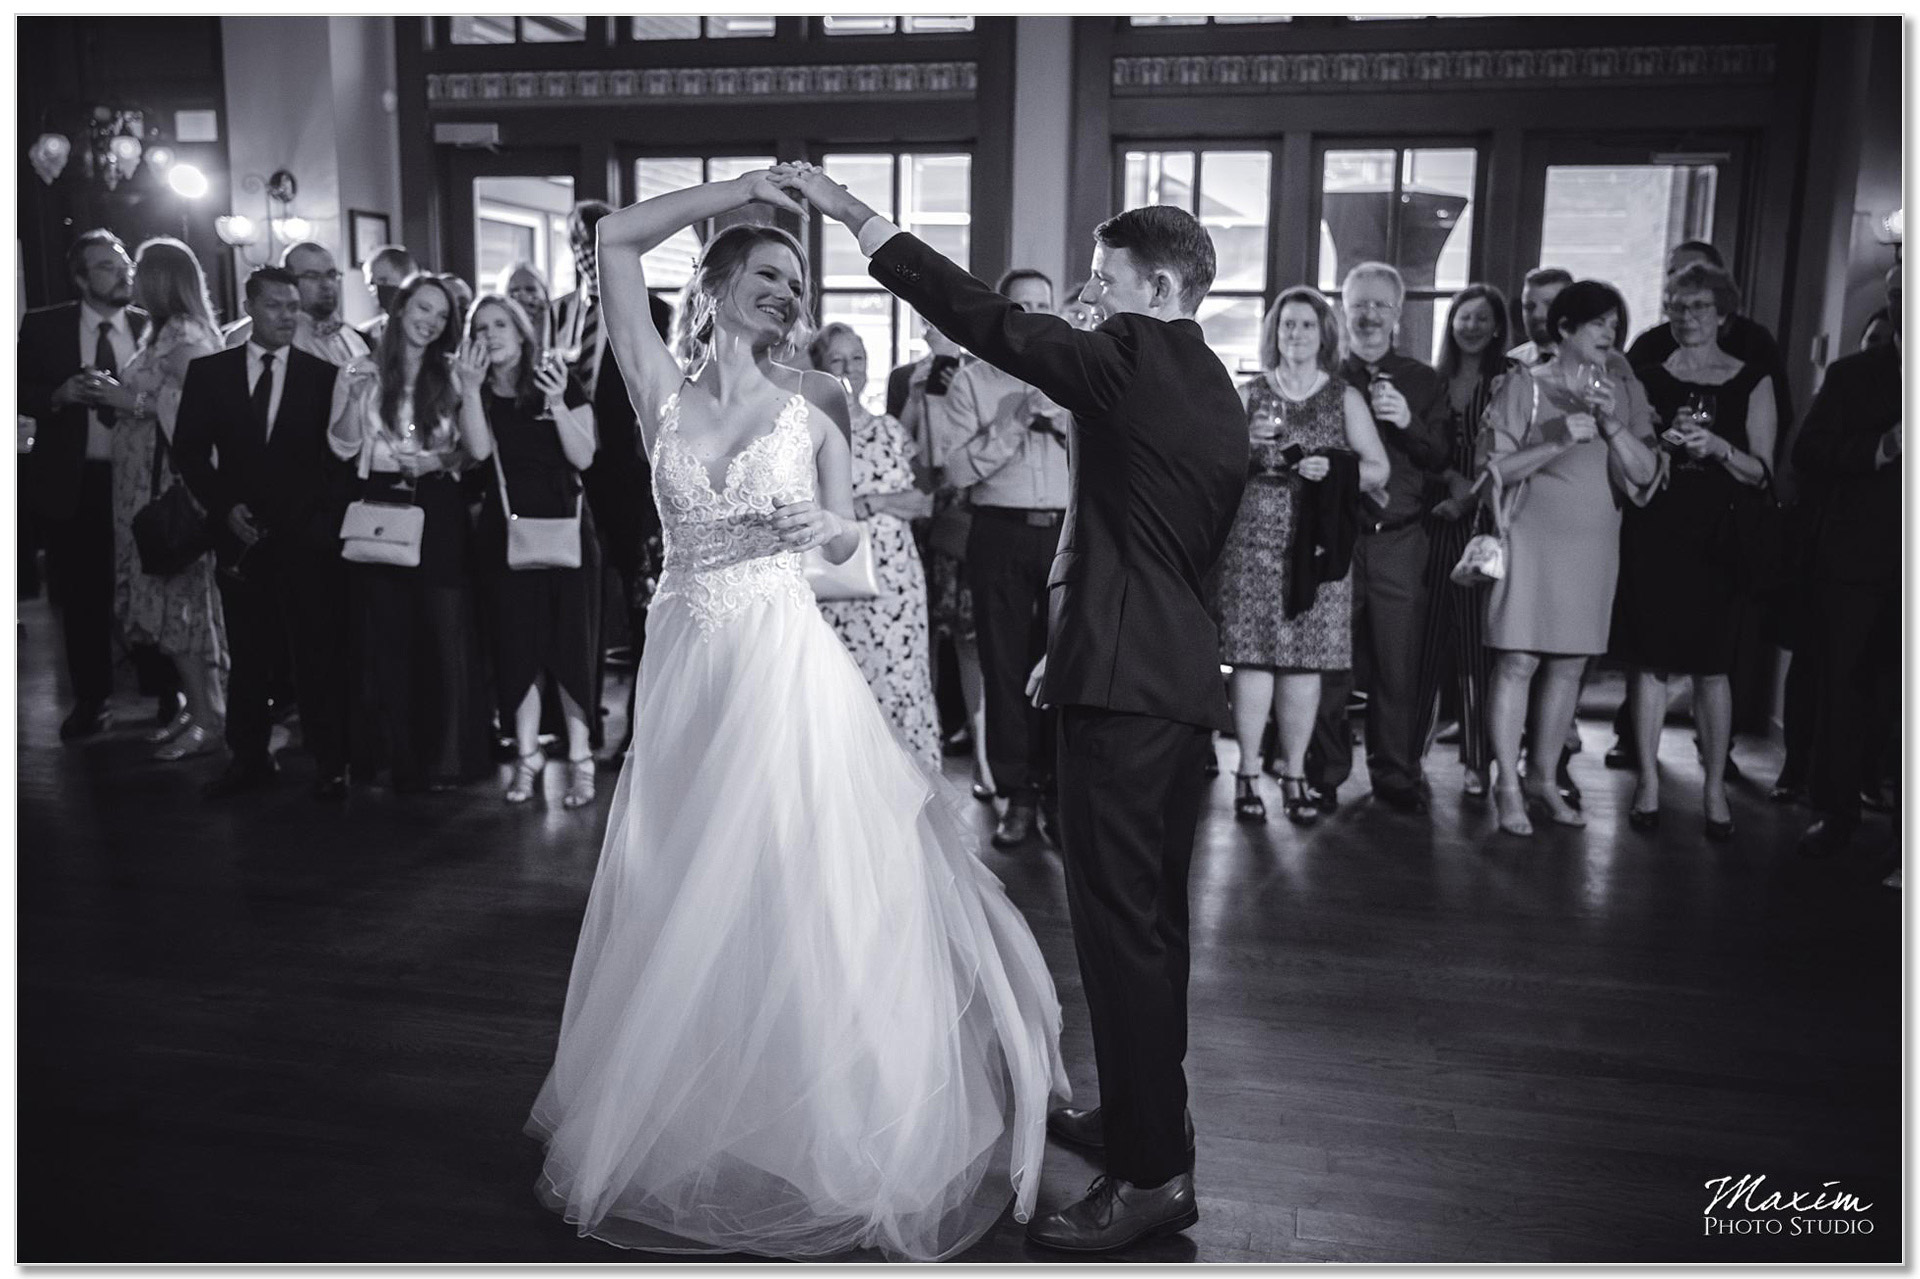 Bud Walters Wedding dance